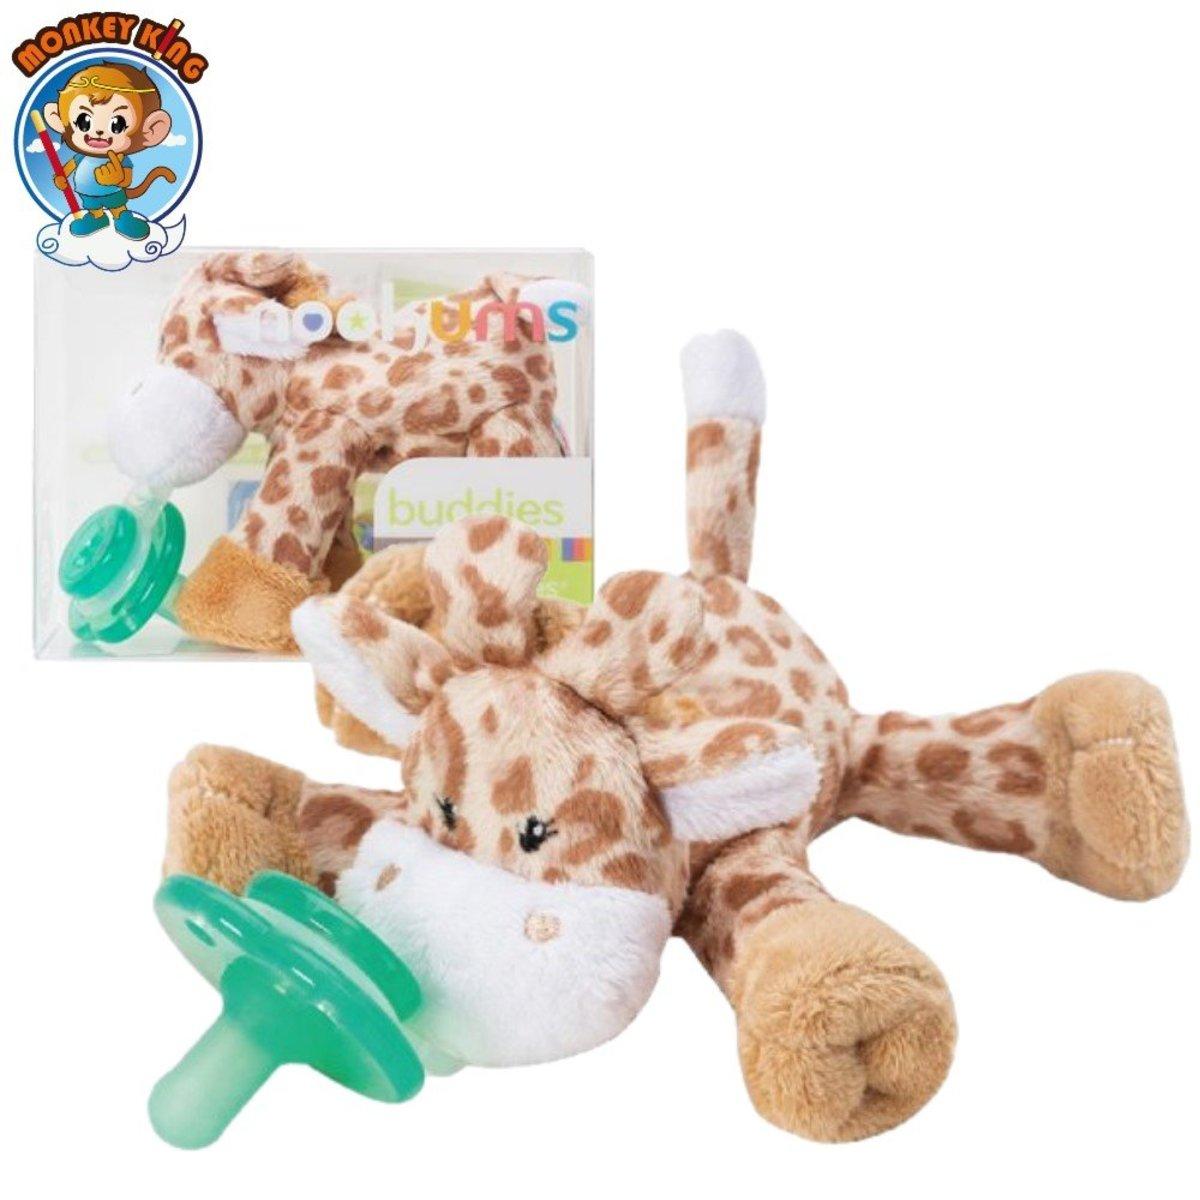 Paci-Plushies Buddies Pacifier Holder - Giraffe